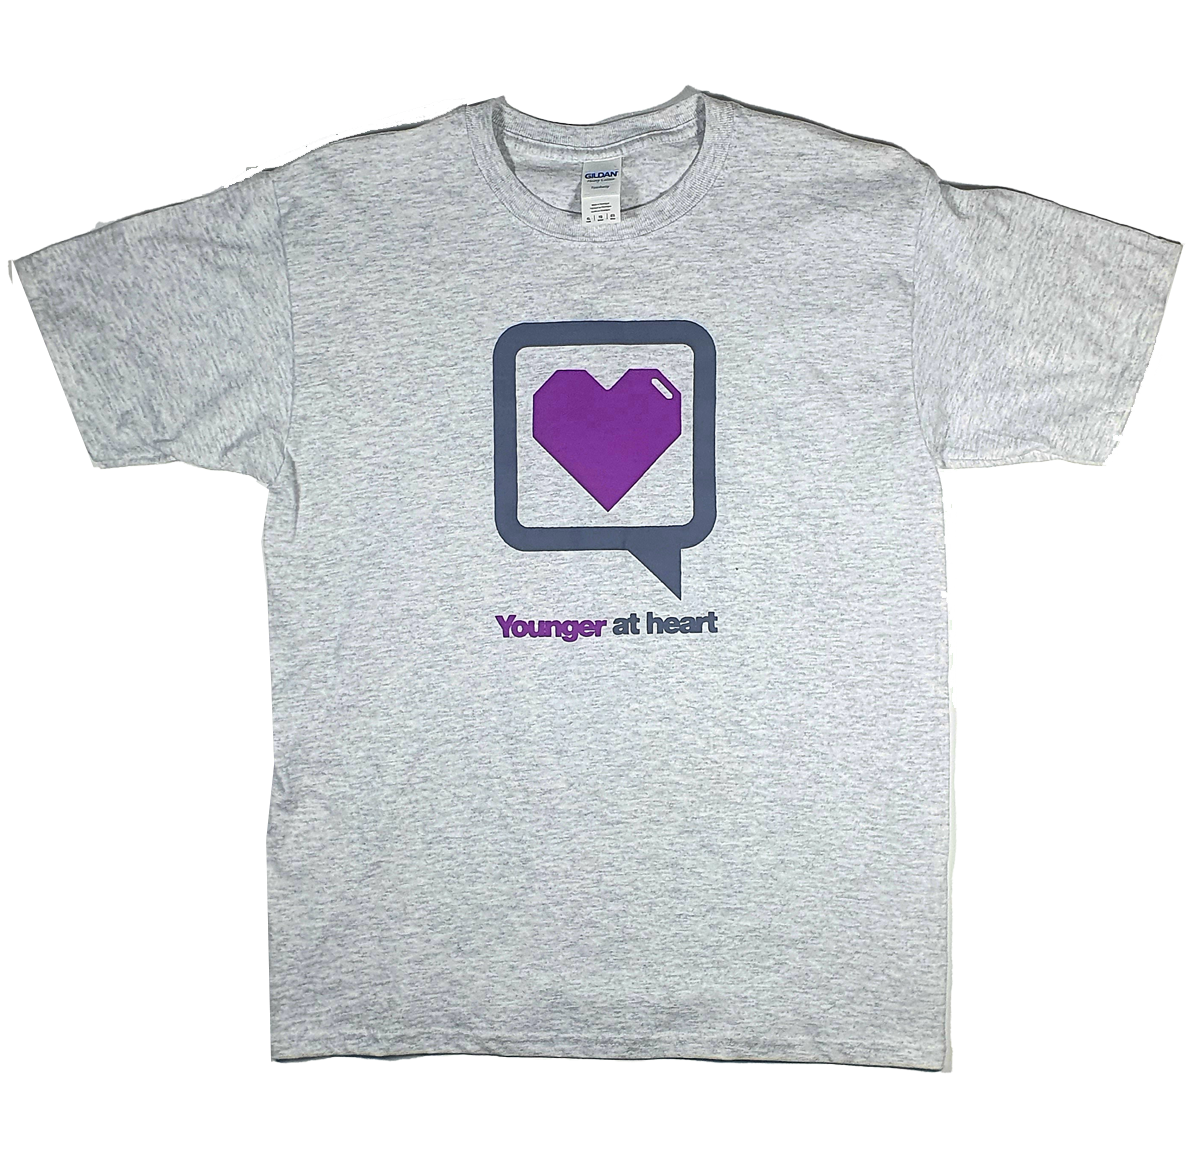 YAH X – OG T-Shirt (Kid Sizes) Light Grey Exclusive streetsale